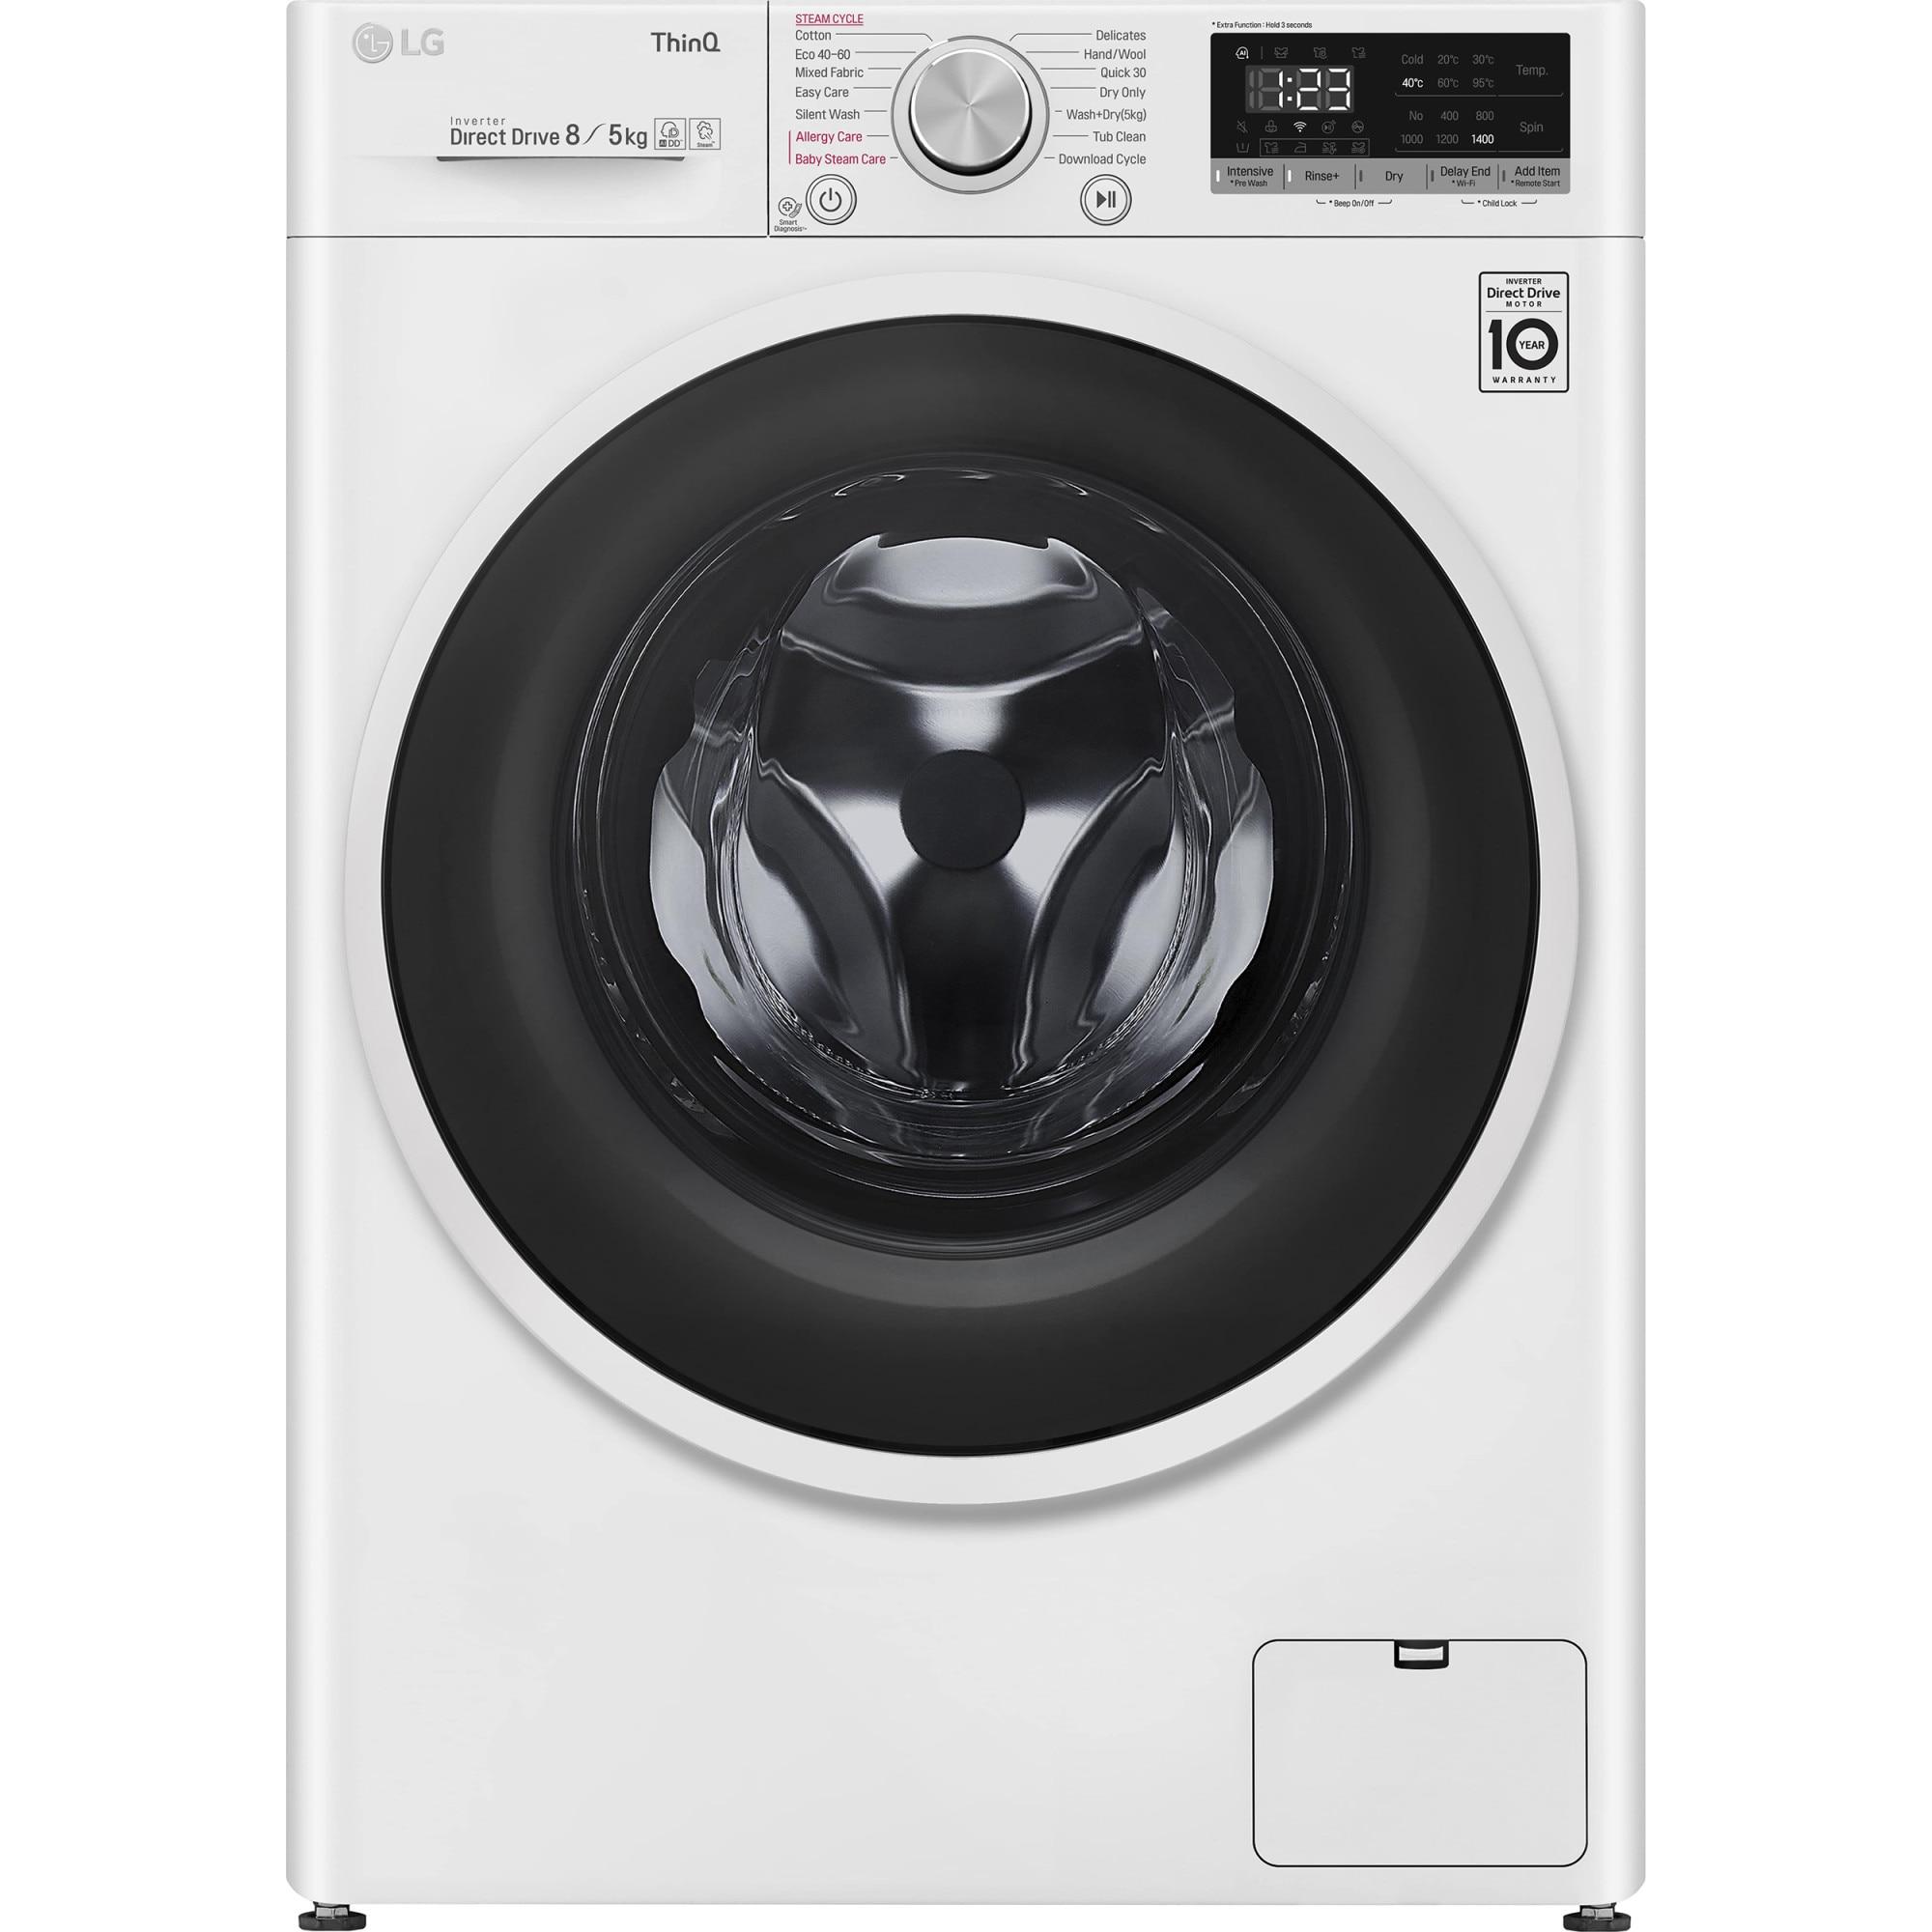 Fotografie Masina de spalat rufe cu uscator LG F4DT408AIDD, Spalare 8 kg, Uscare 5 kg, 1400 RPM, Clasa D, AI Direct Drive, Steam, Smart Diagnosis, WiFi, Alb